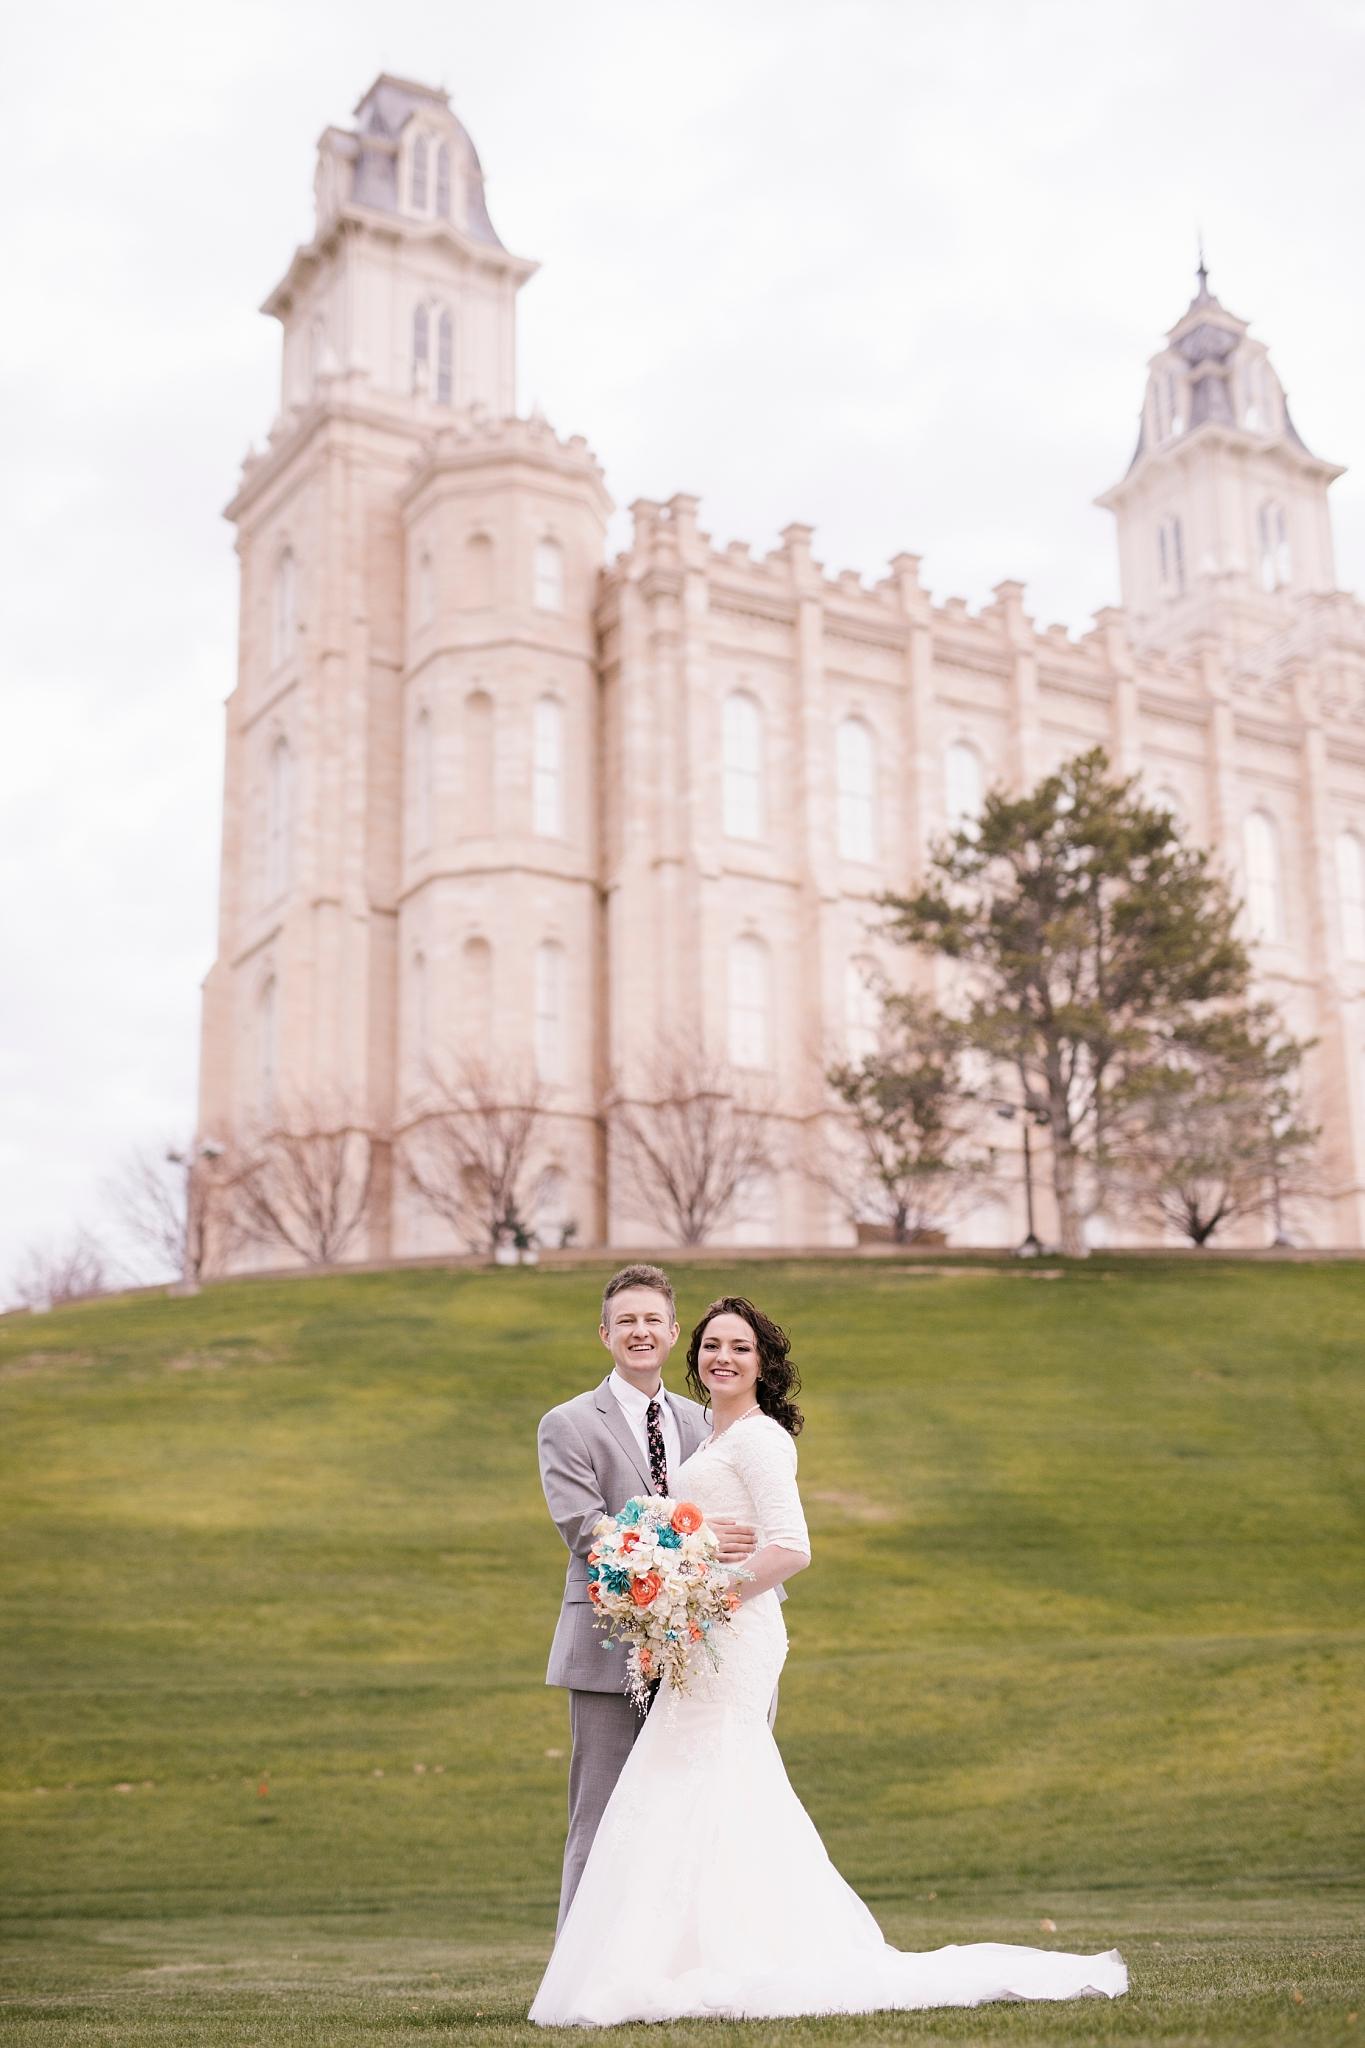 BA-Bridals-138_Lizzie-B-Imagery-Utah-Wedding-Photographer-Engagement-Photography-Salt-Lake-City-Park-City-Utah-County-Manti-Utah-Temple.jpg